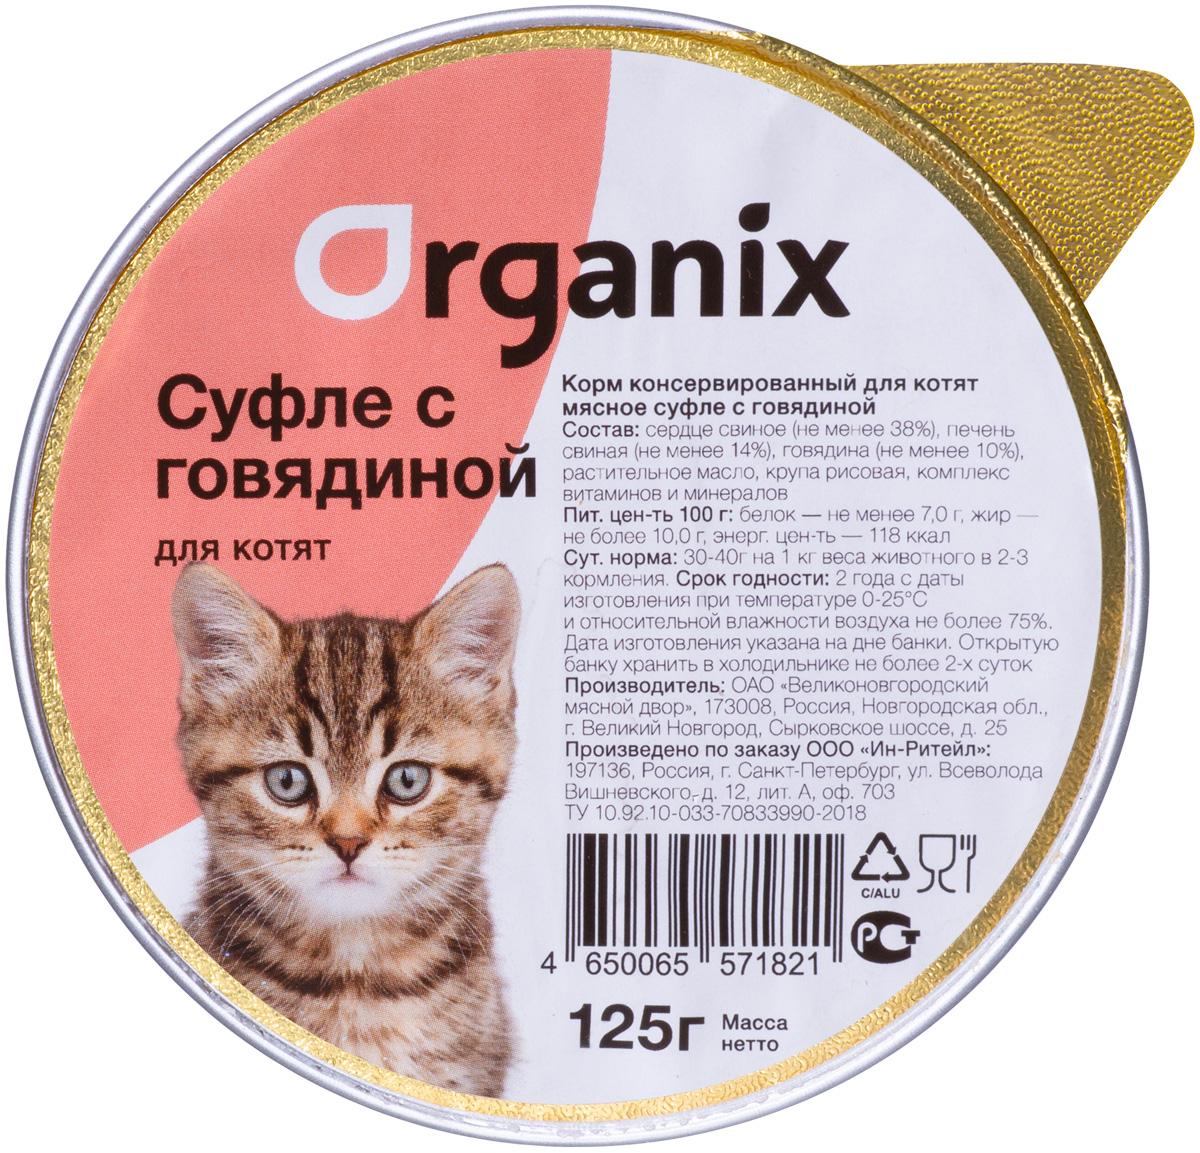 Organix мясное суфле для котят с говядиной 125 гр (125 гр)